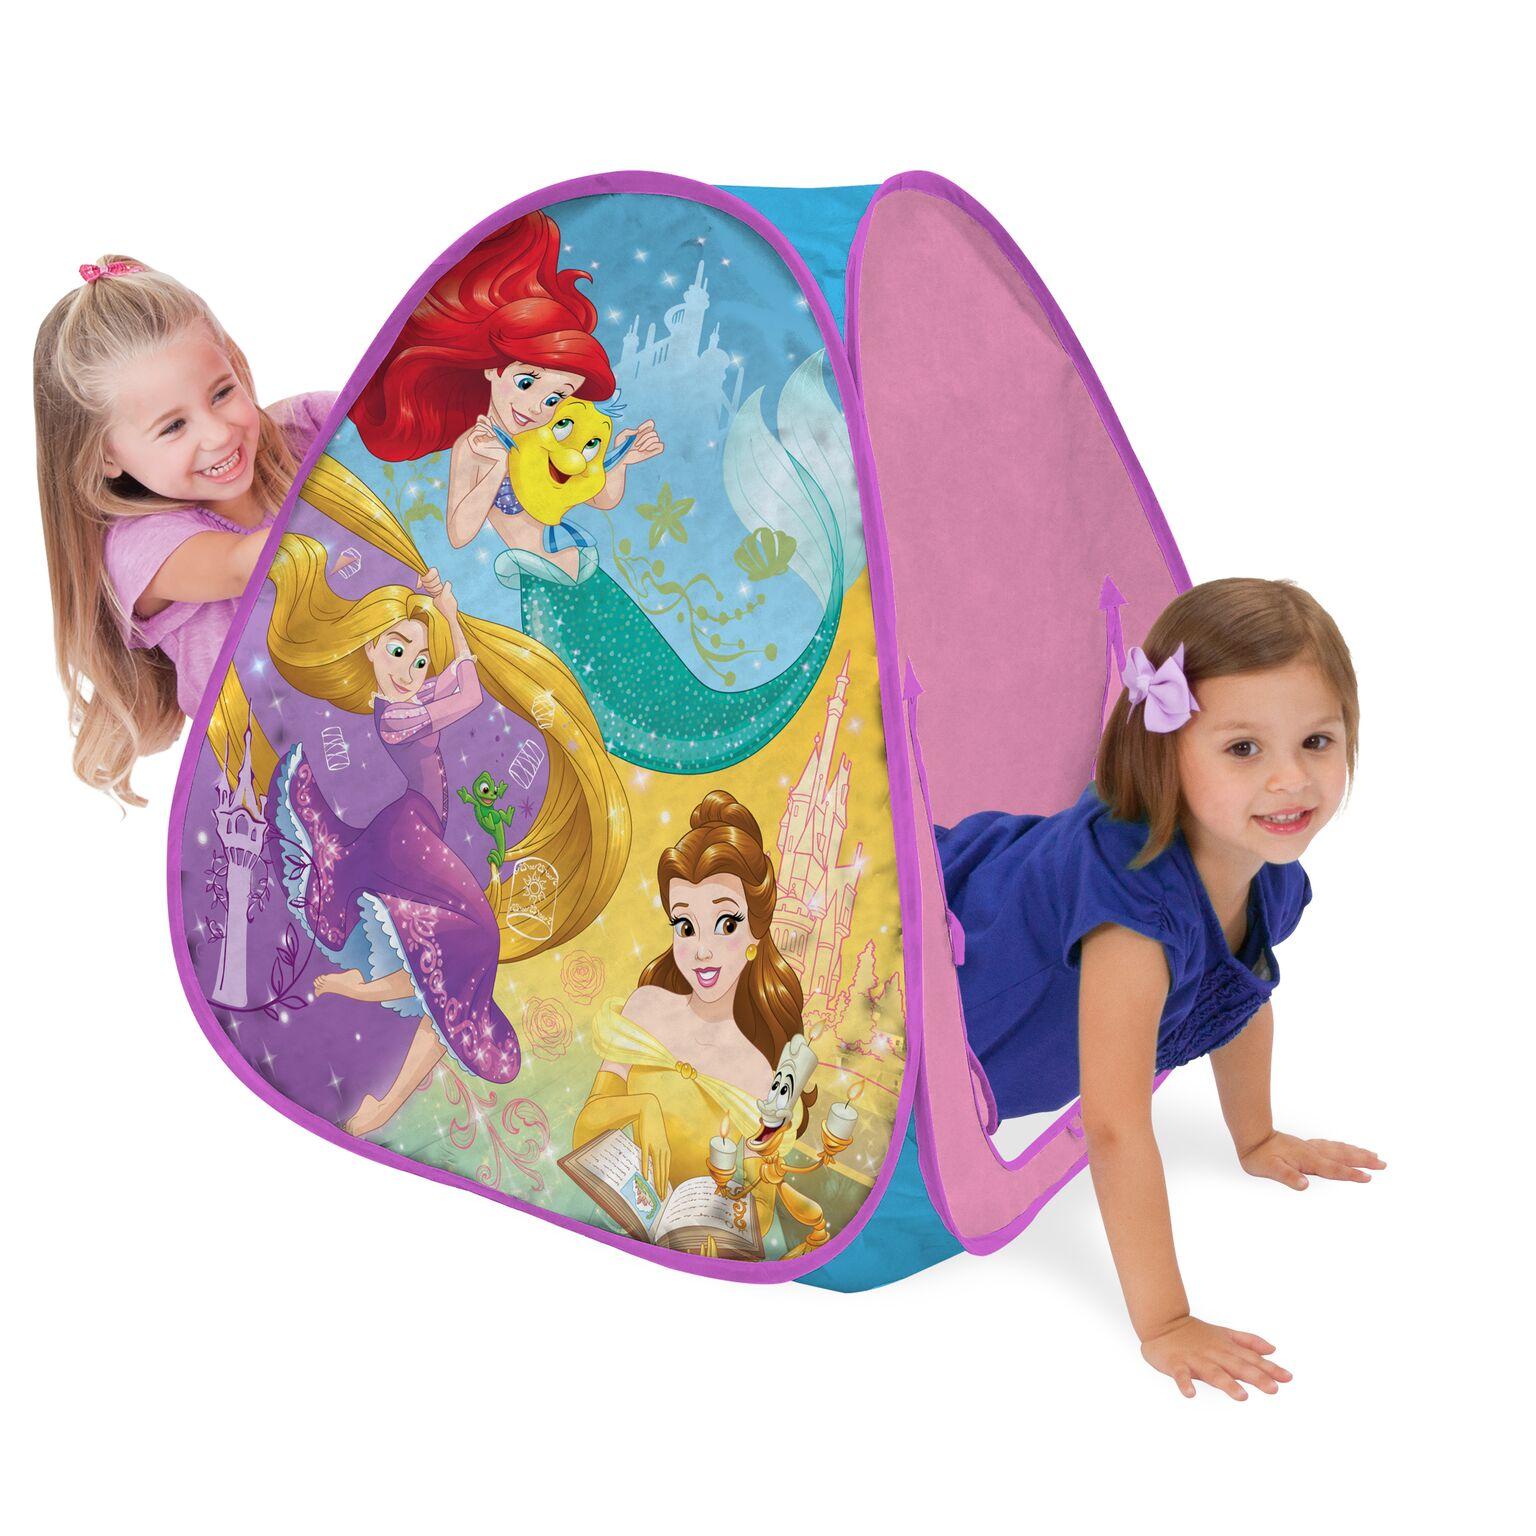 Playhut Disney Princess Classic Hideaway Play Tent